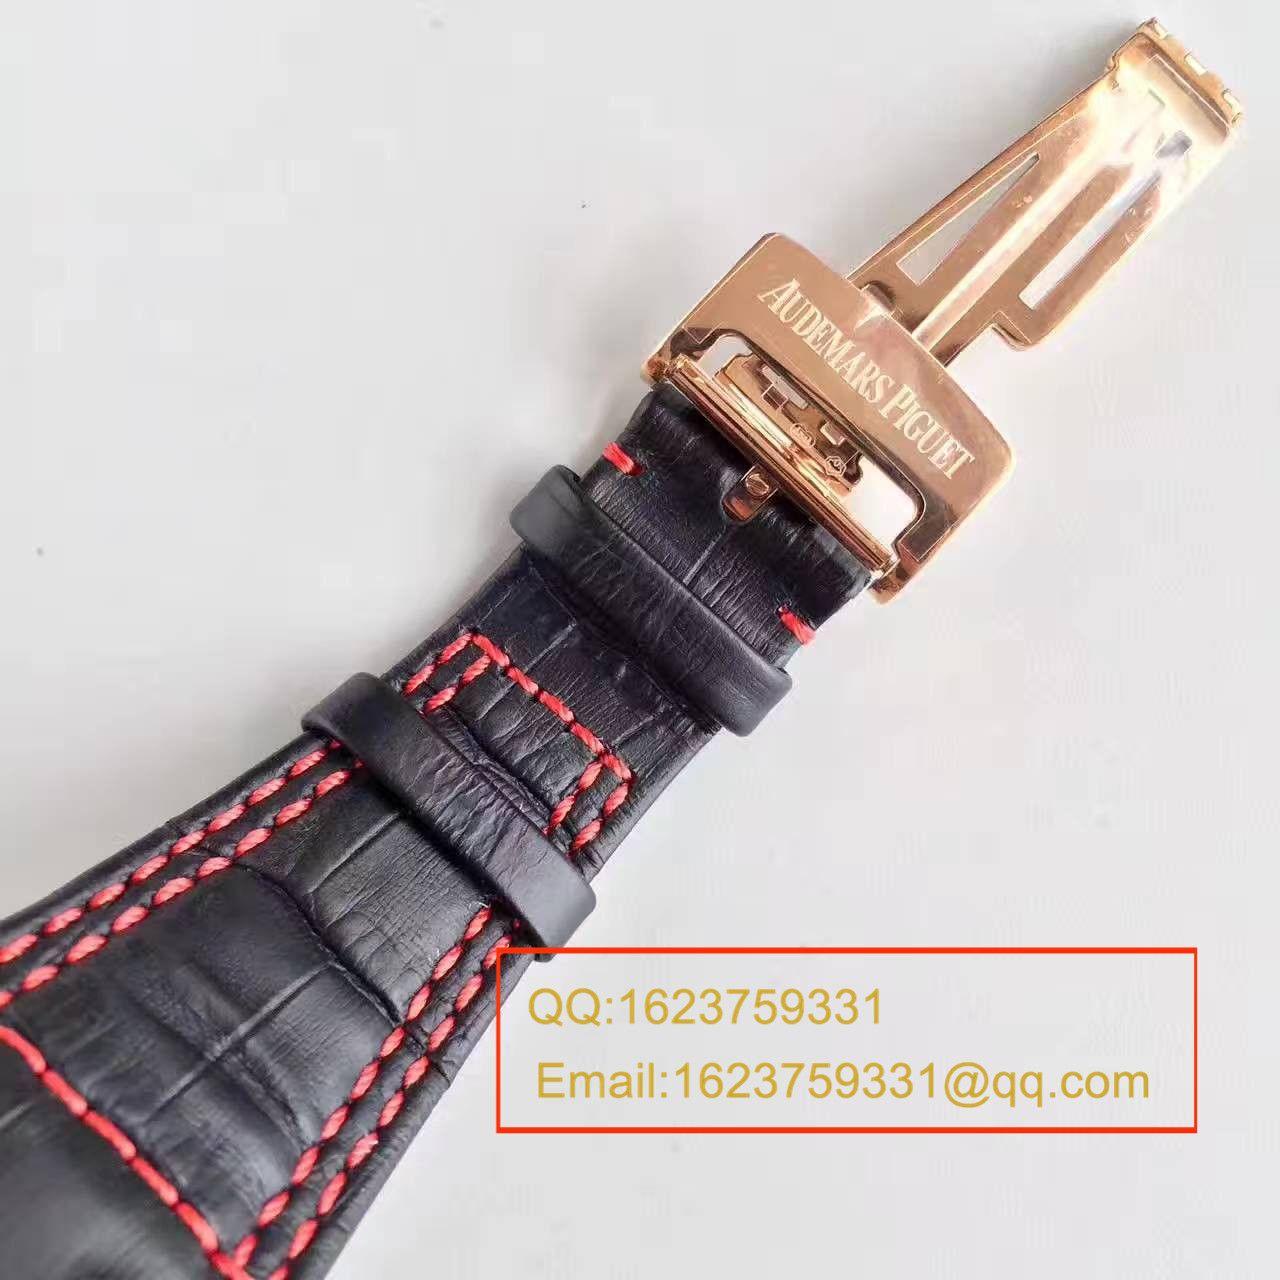 【JF厂顶级复刻】爱彼千禧系列26284RO.OO.D002CR.01 BR2机械腕表